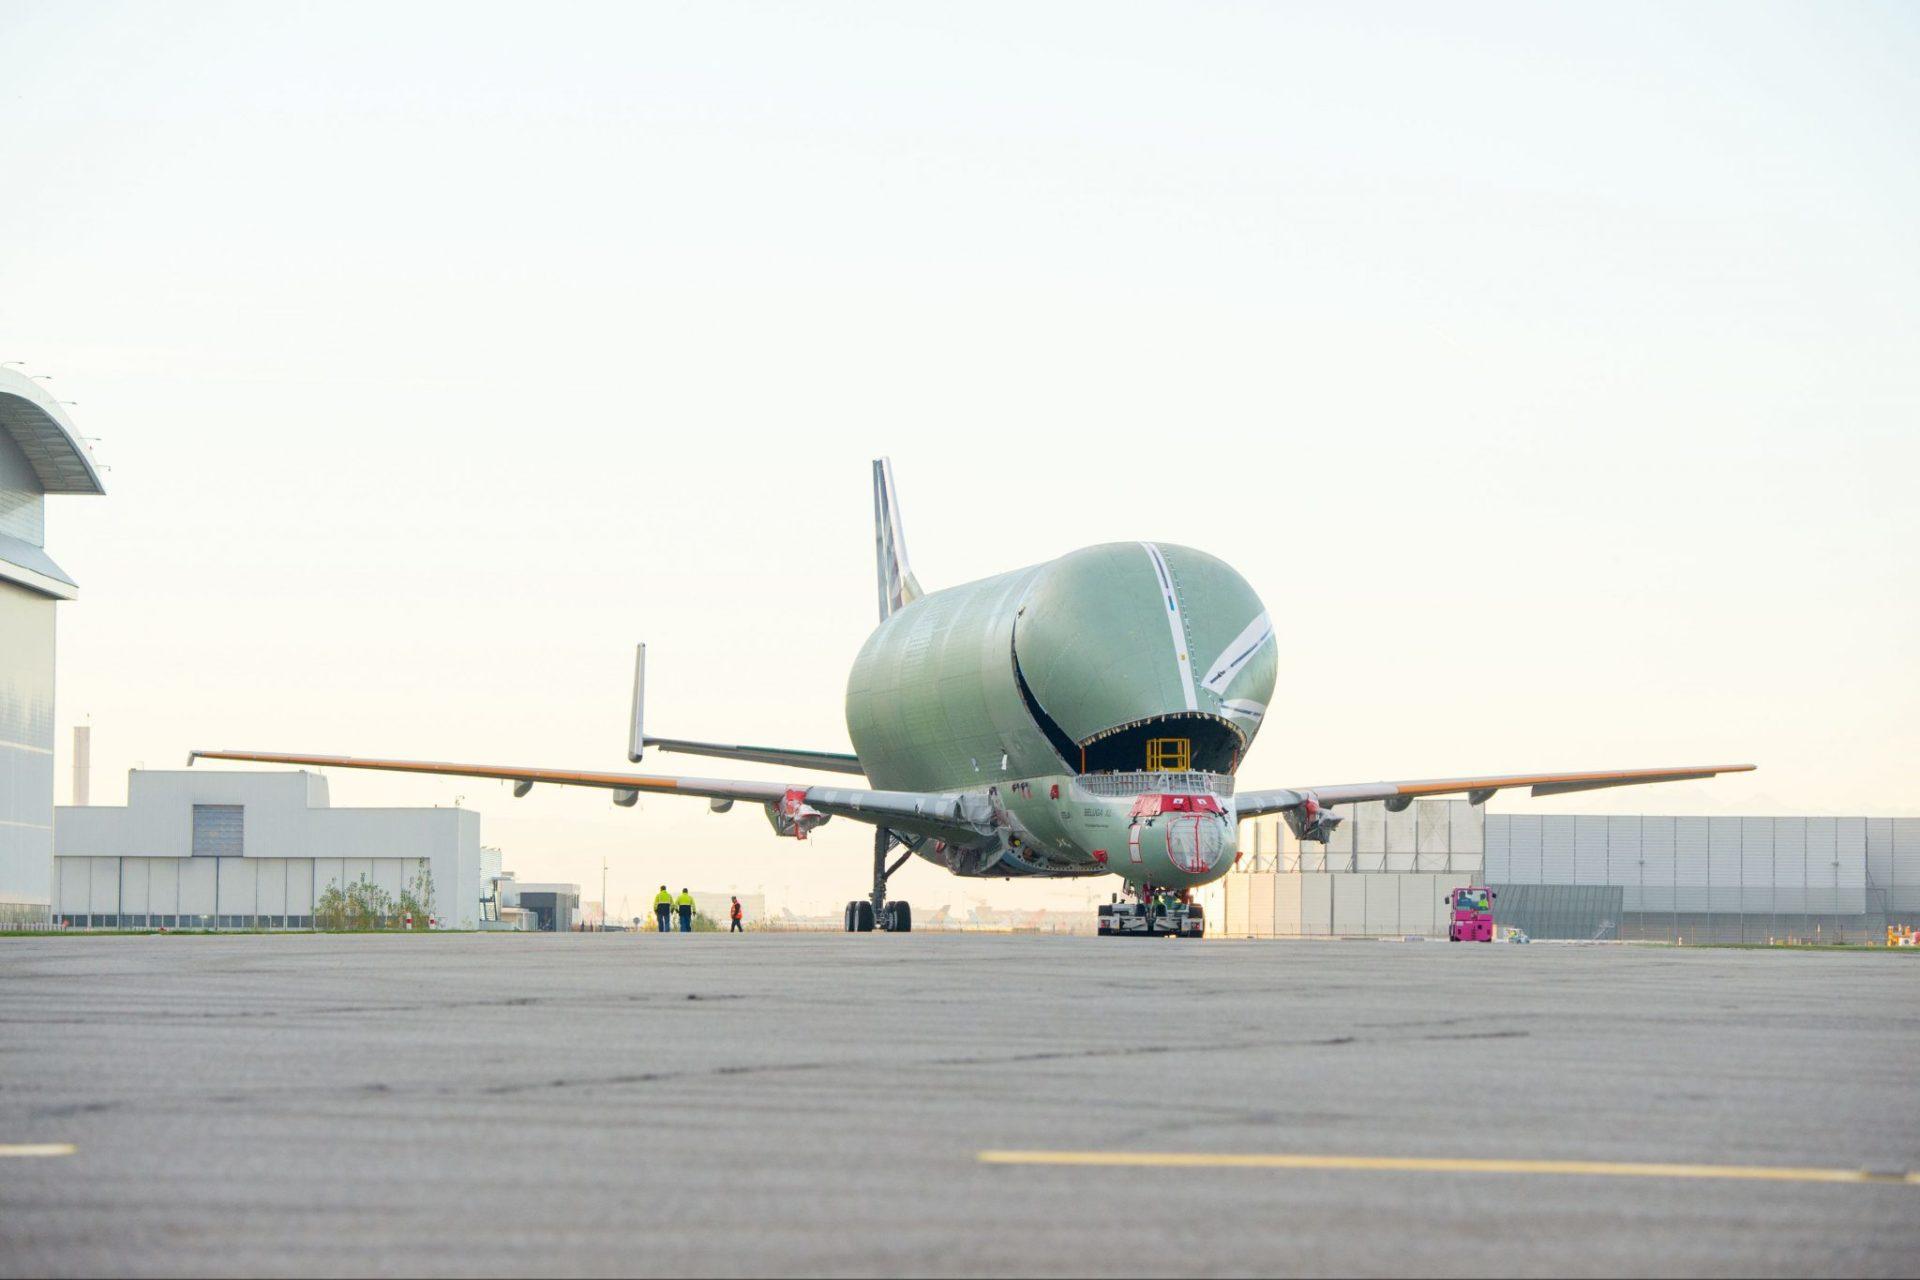 BelugaXL No1 (Image: P.Masclet/Airbus)